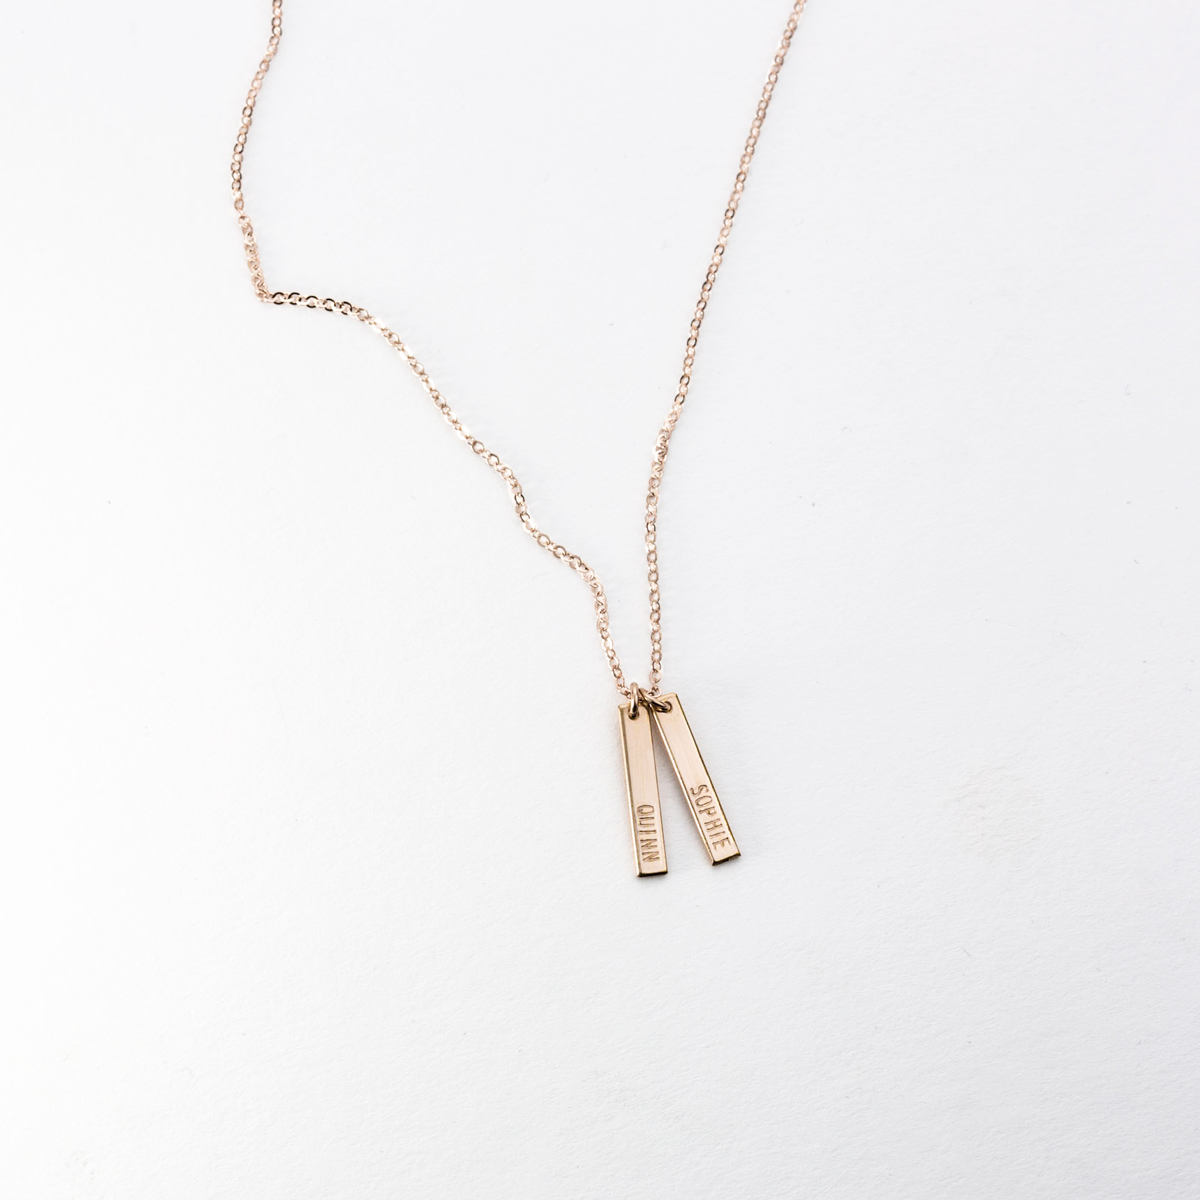 GLDN Minimal Name Necklace,  ONO